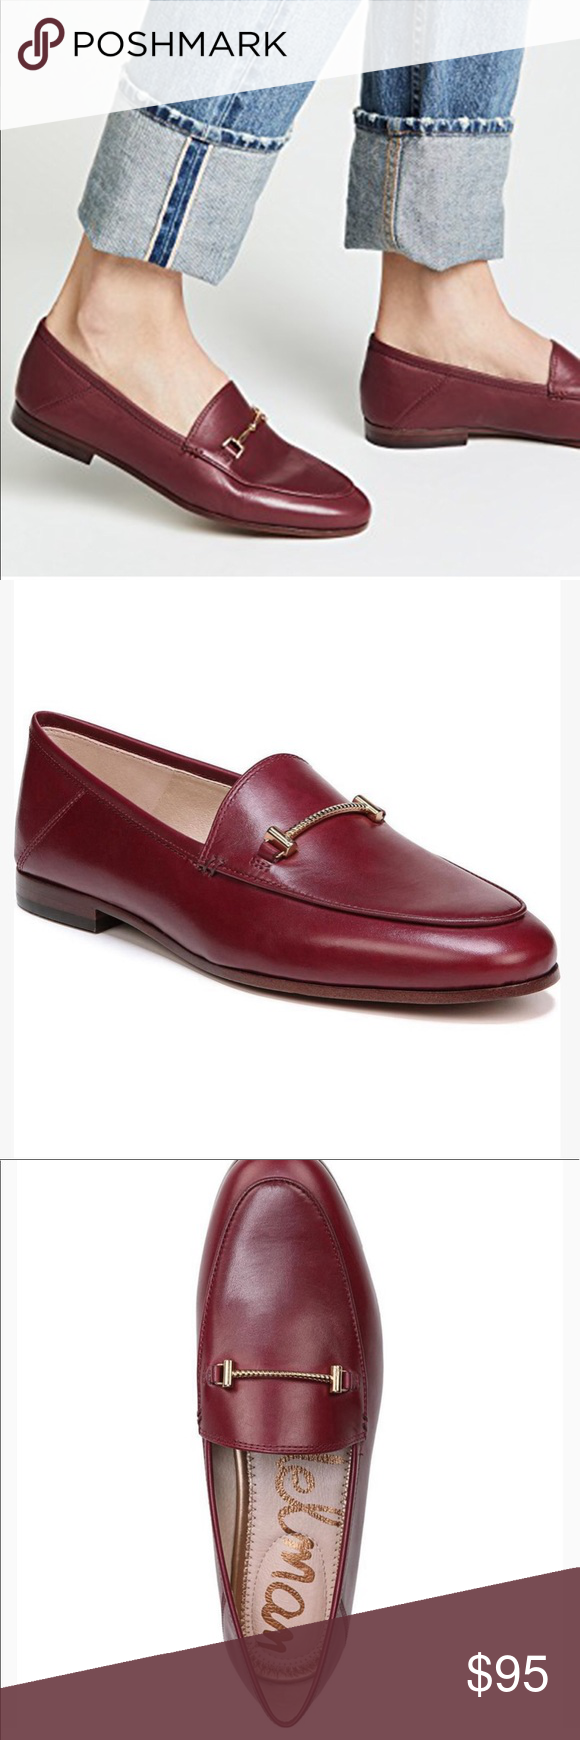 94775e9c88a NWB SAM EDELMAN Lior Leather Loafer Burgundy Red SAM EDELMAN Lior Leather  Loafer in Beet Red